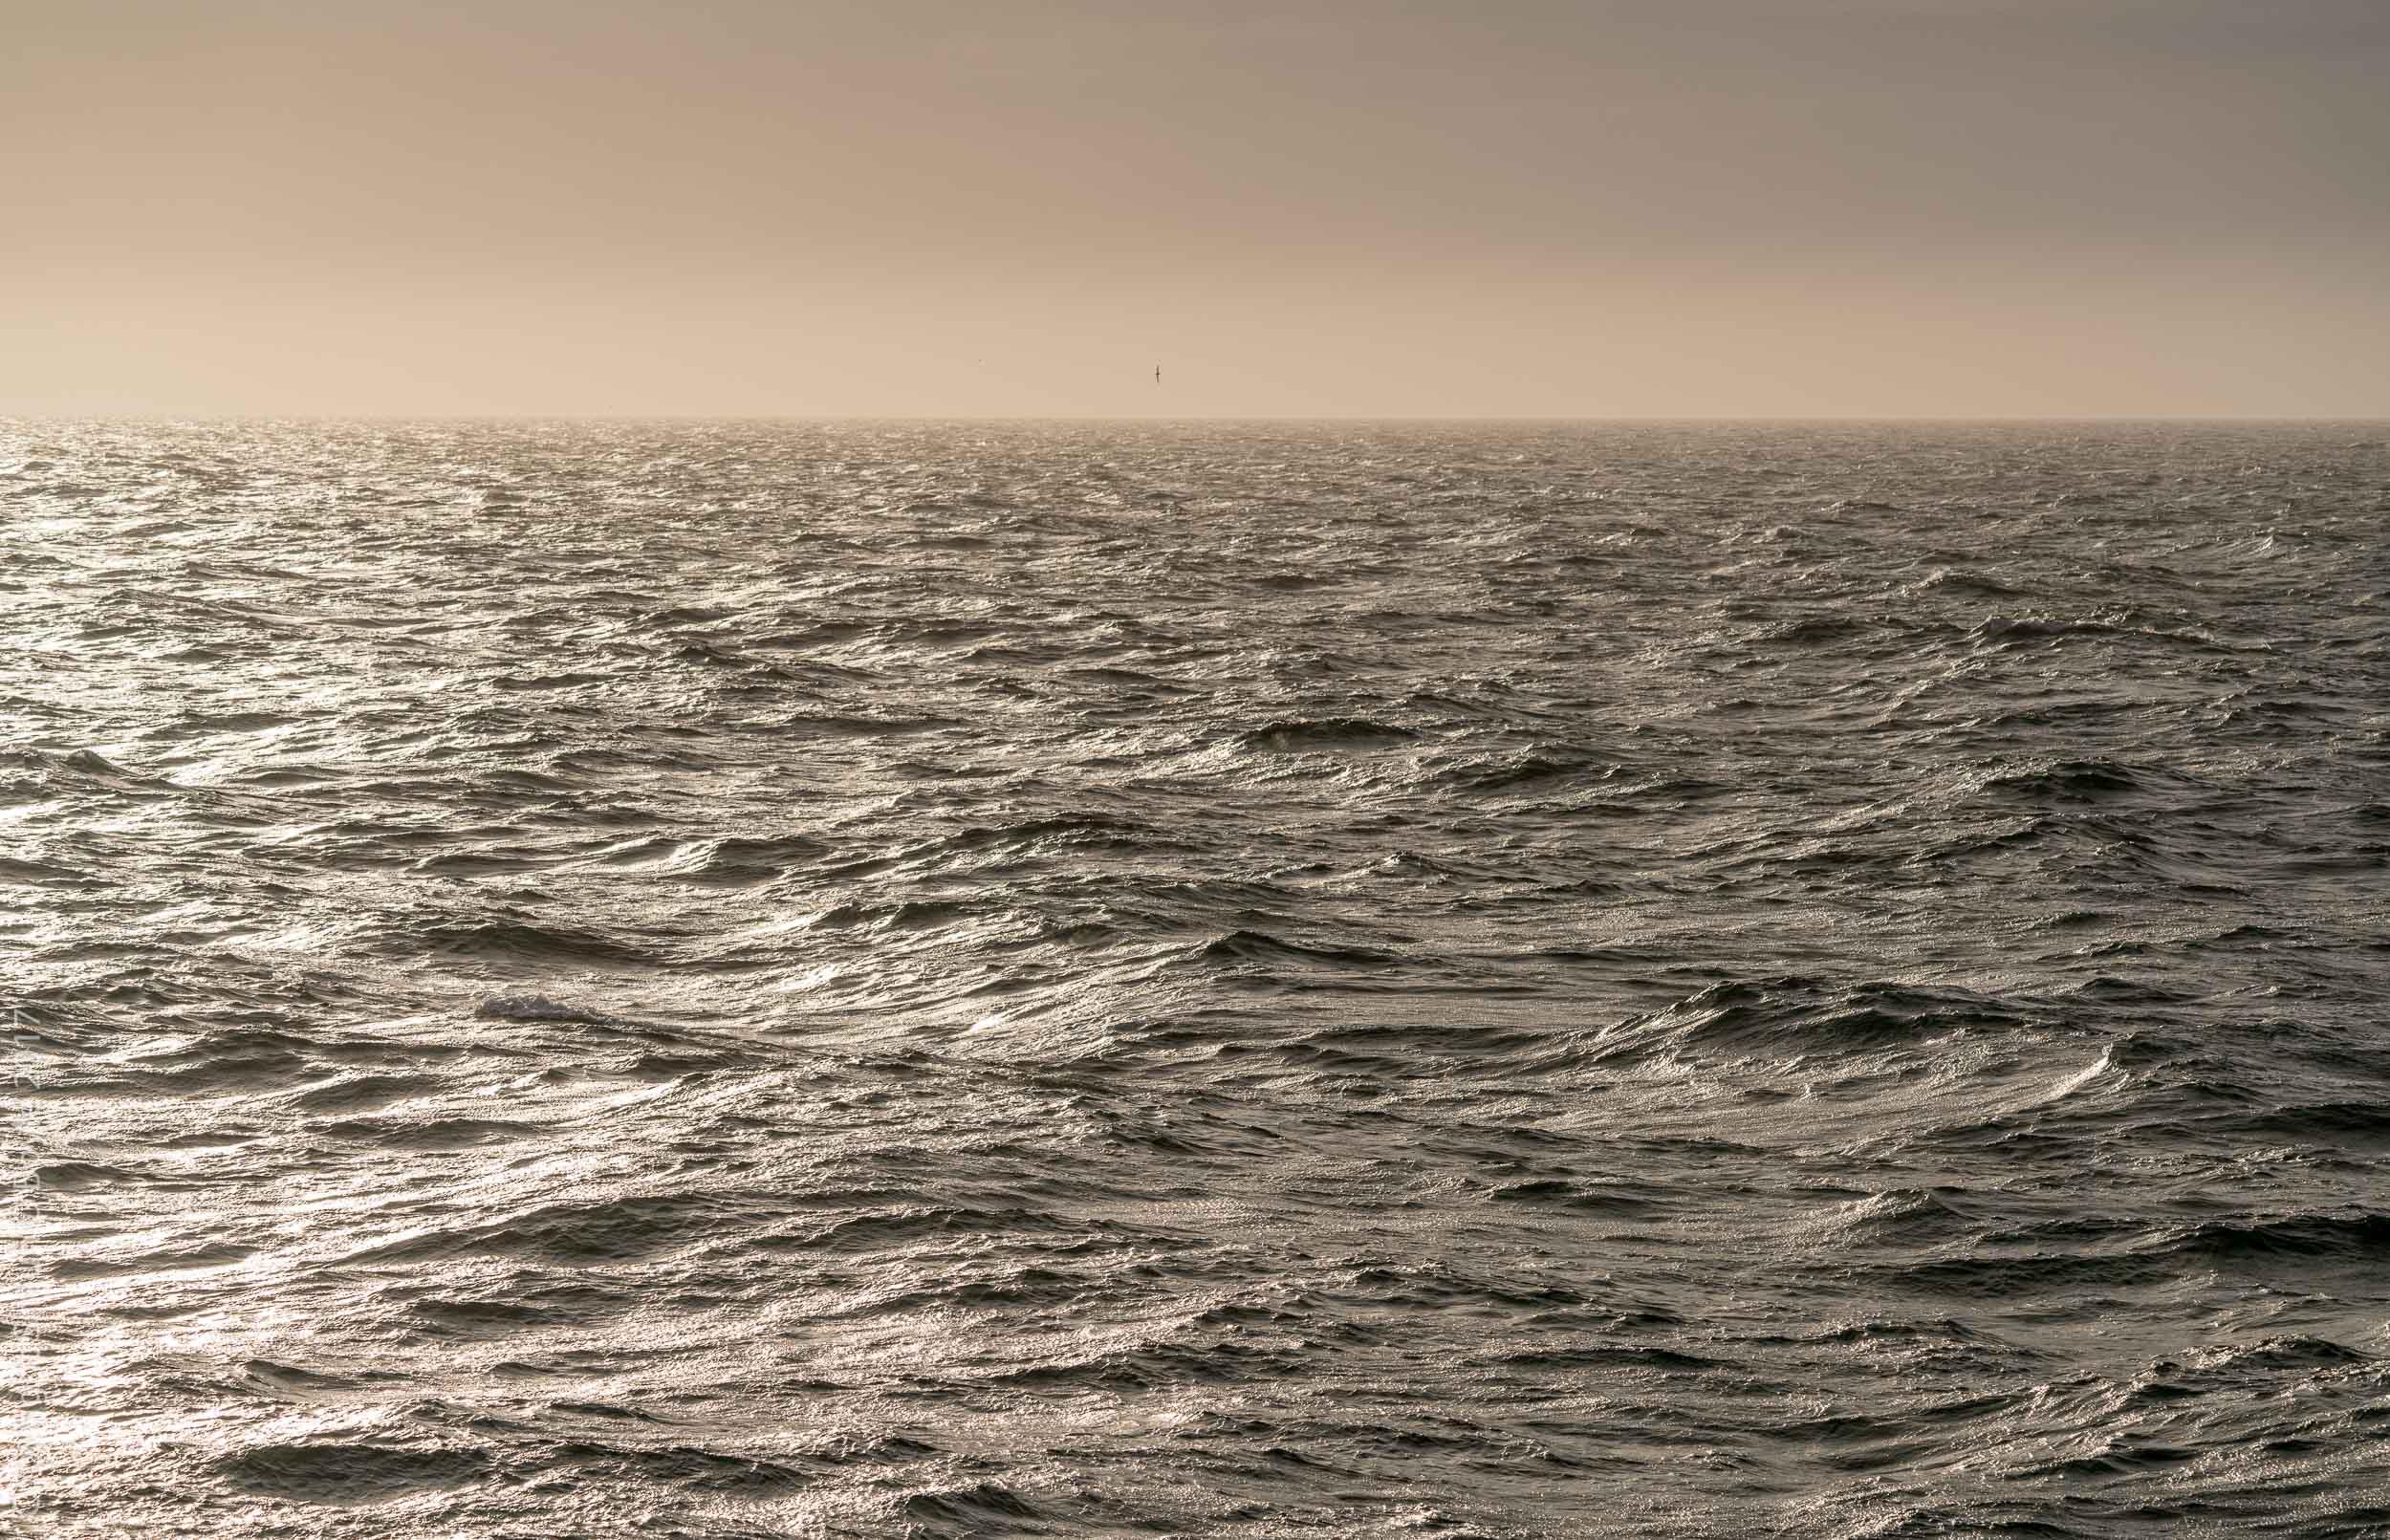 Drake Passage on a calm evening